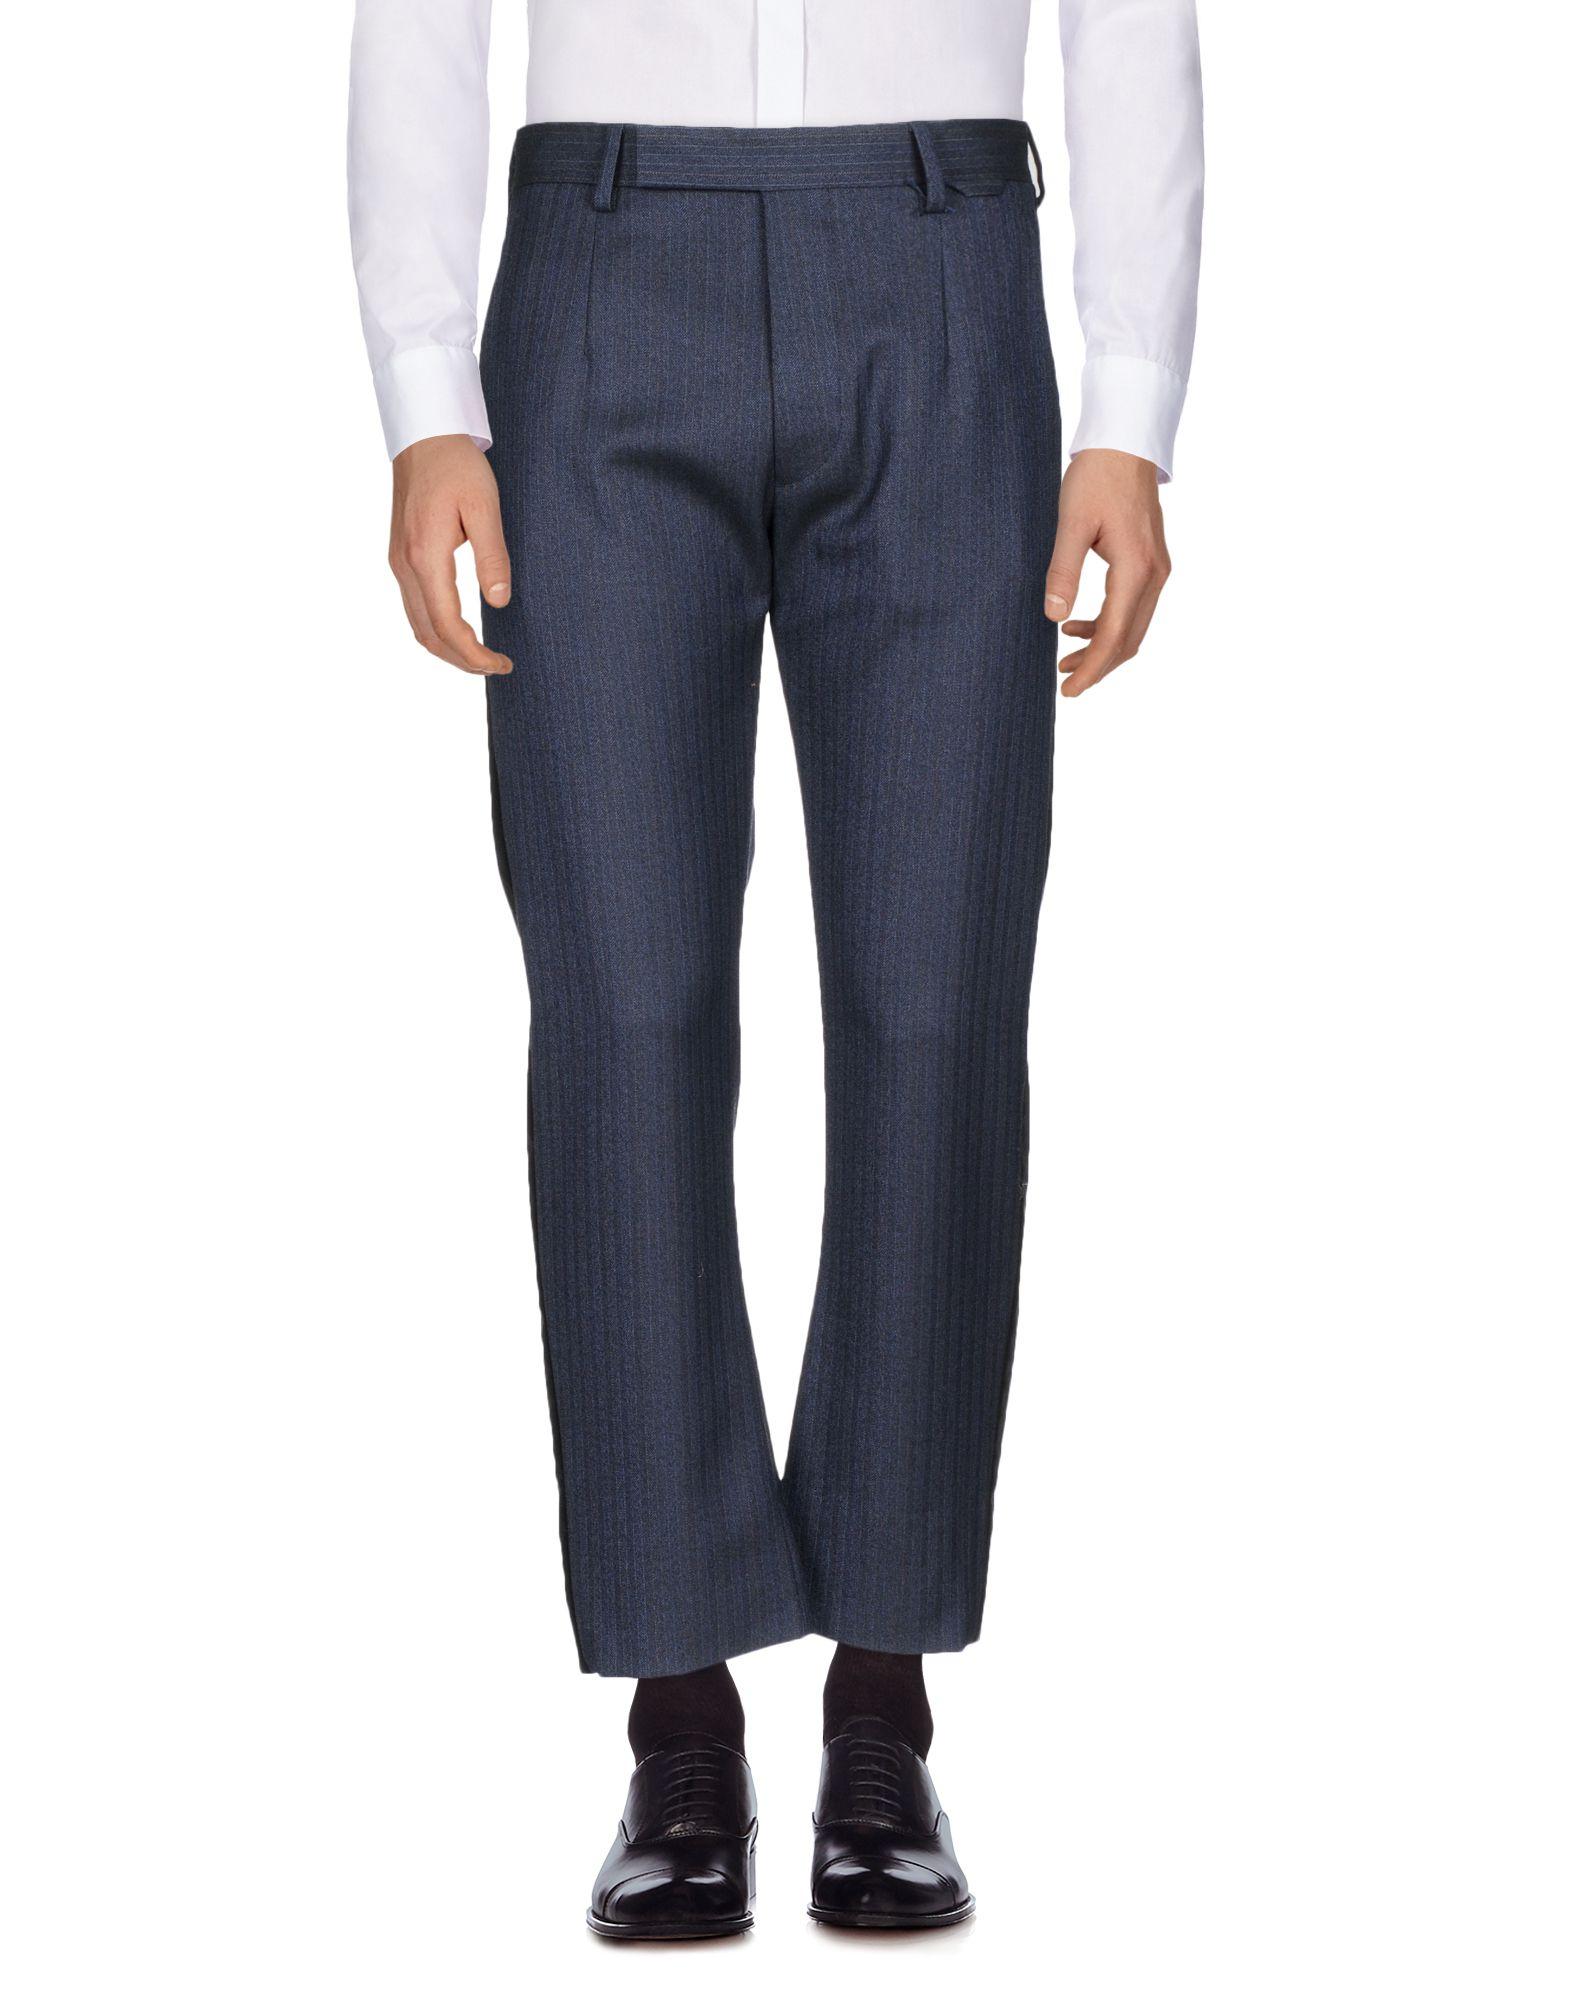 Pantalone Prada herren - 13180062HJ